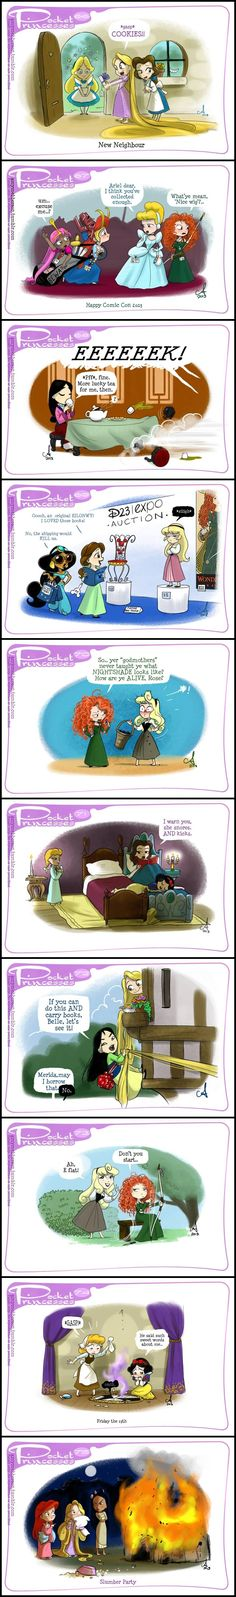 Pocket Princesses (Part 7) by Amy Mebberson